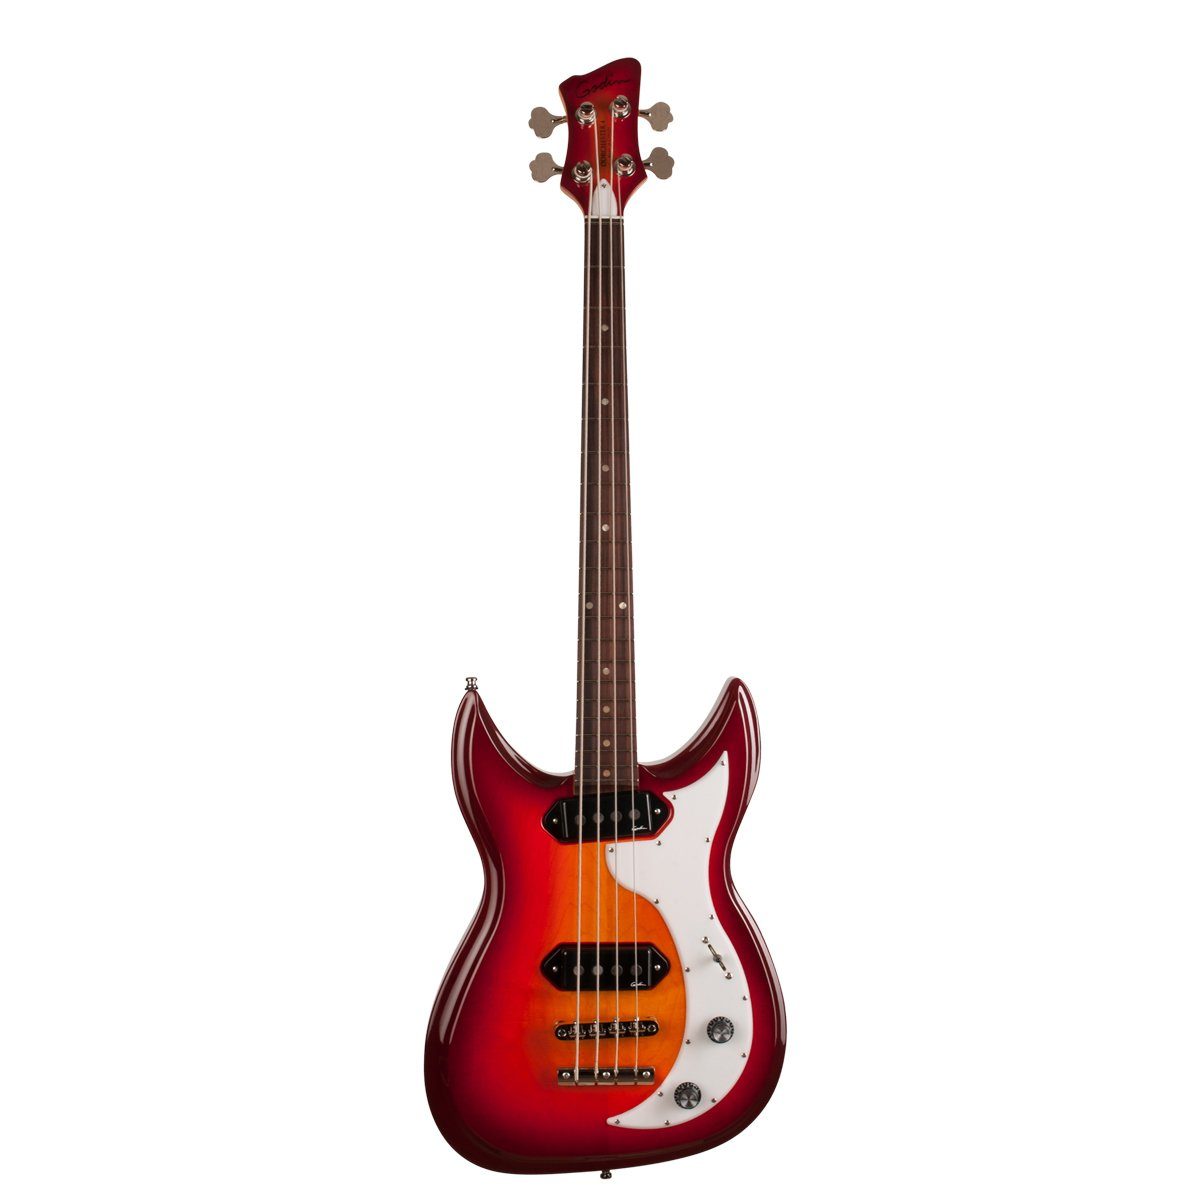 Godin 42685 Dorchester 4 String Bass Guitar w/gig bag